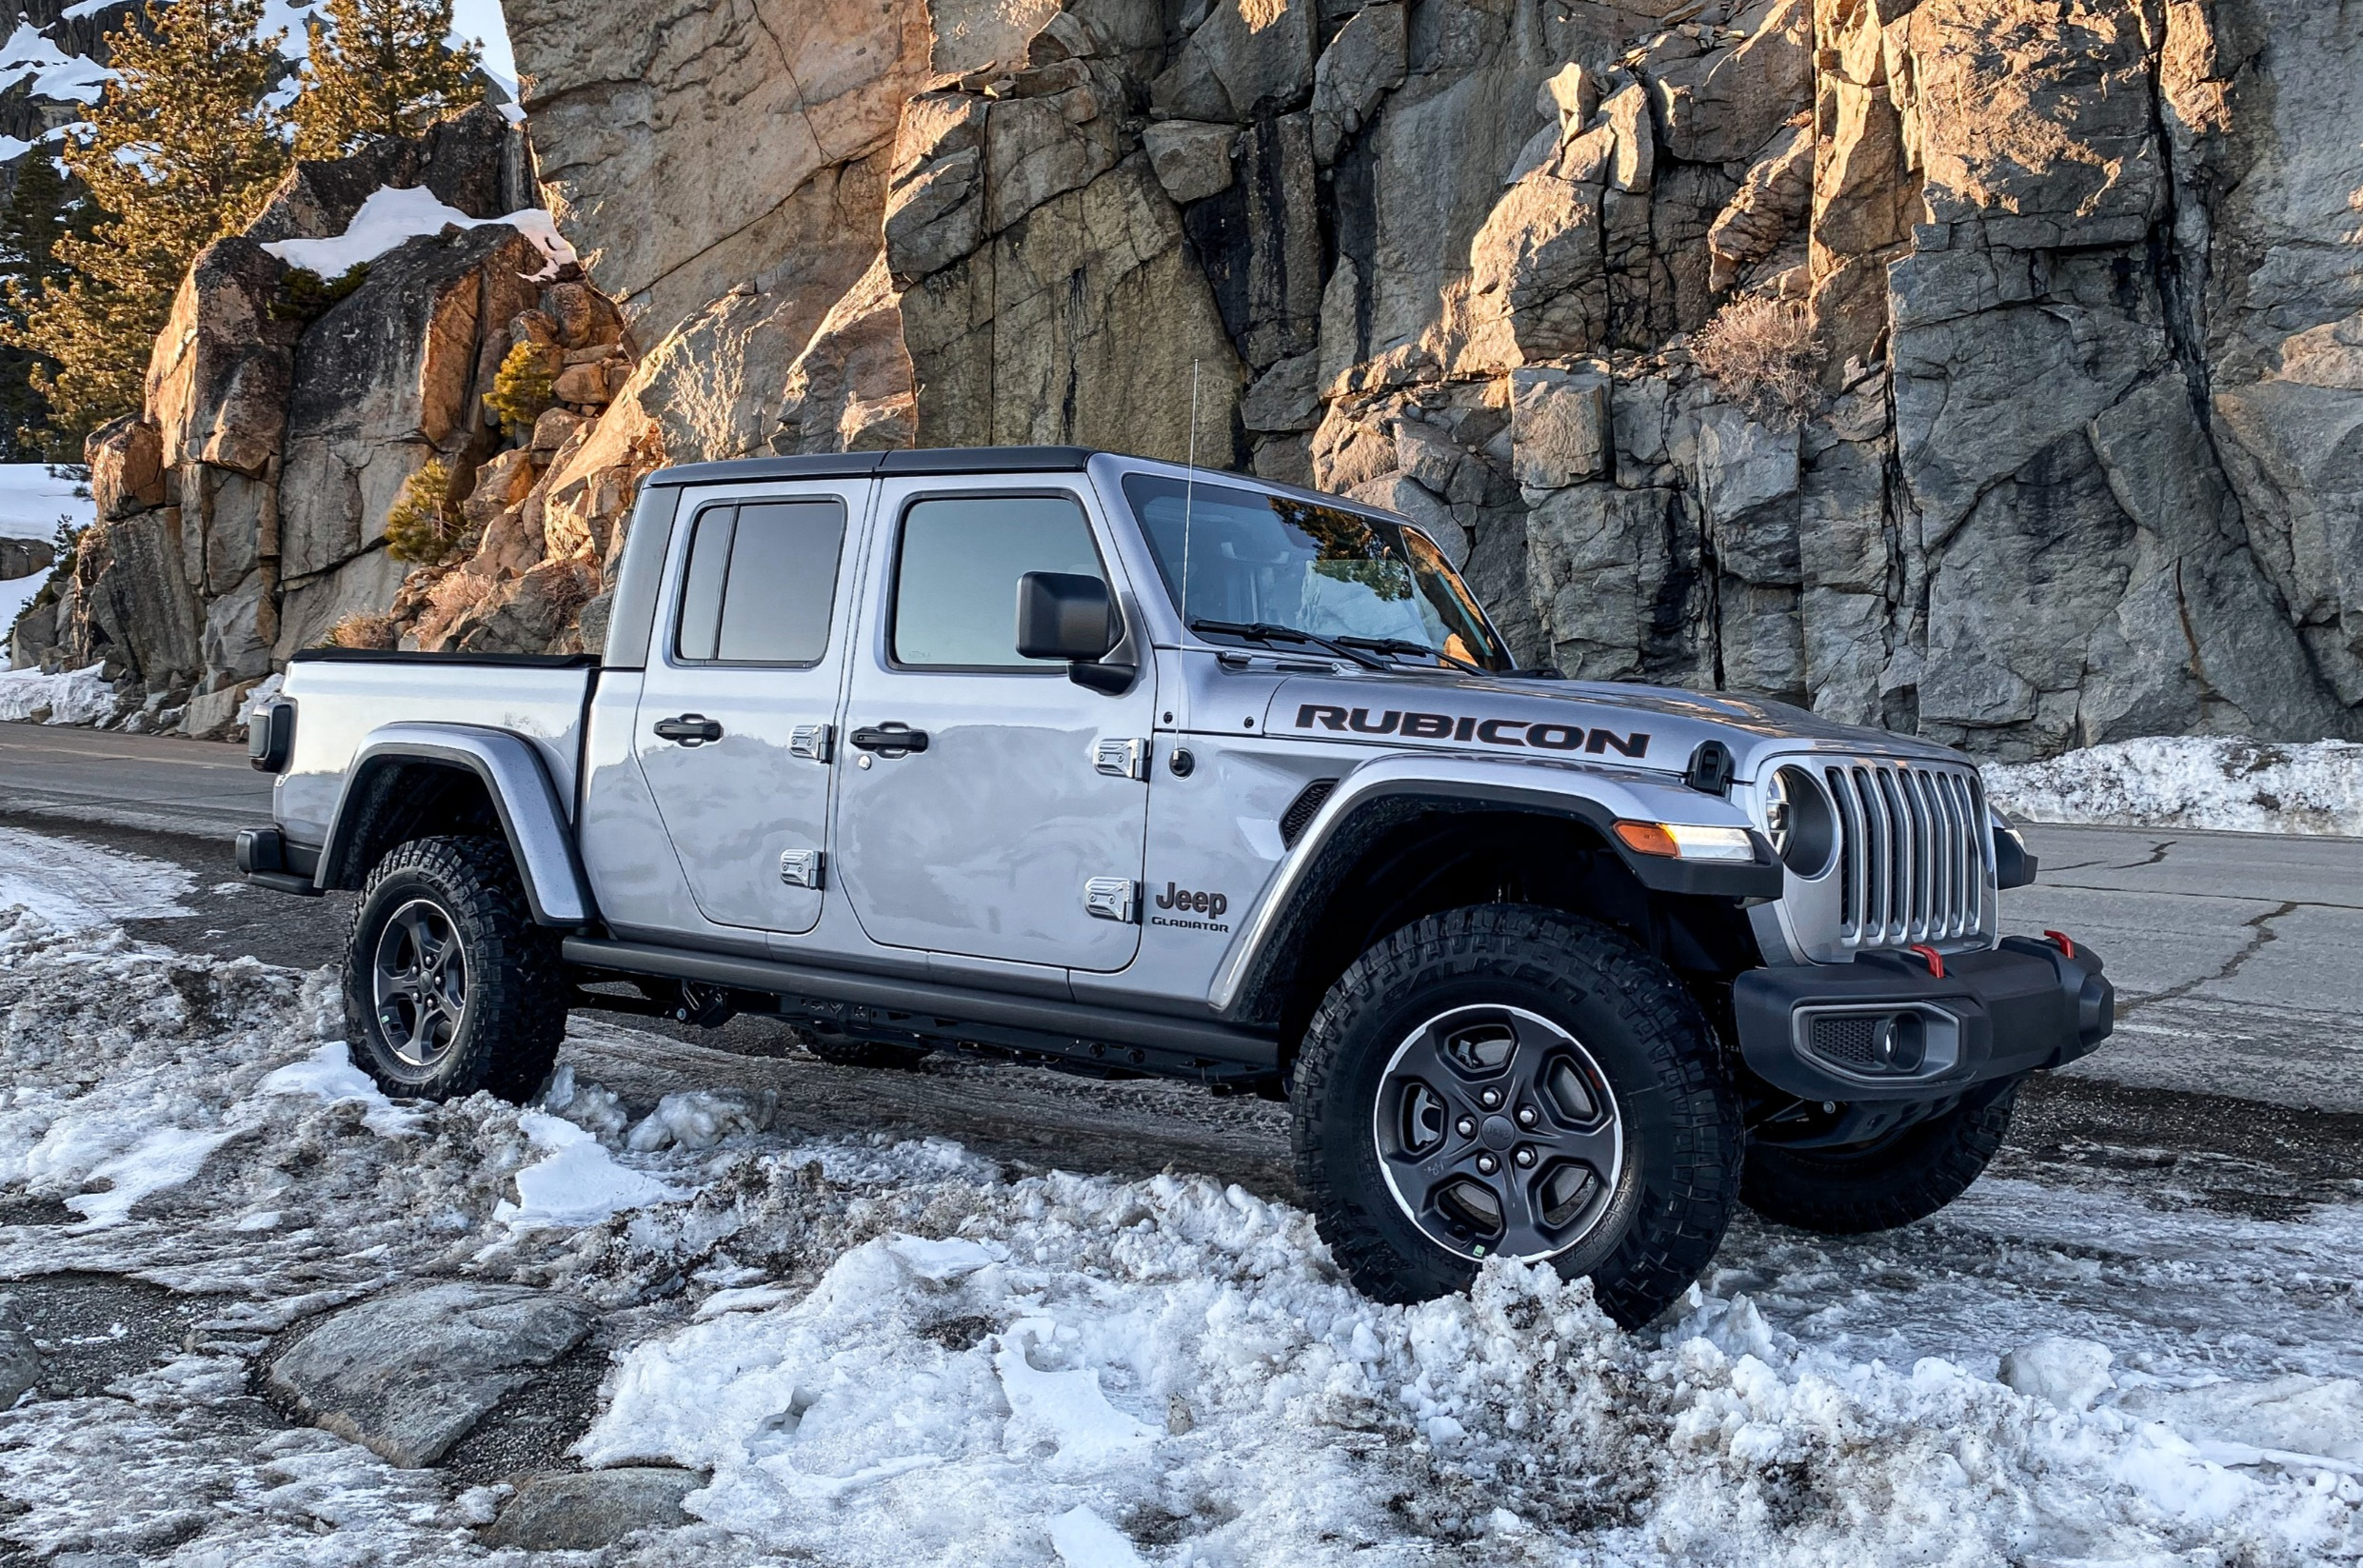 Jeep Gladiator Rubicon 4x4